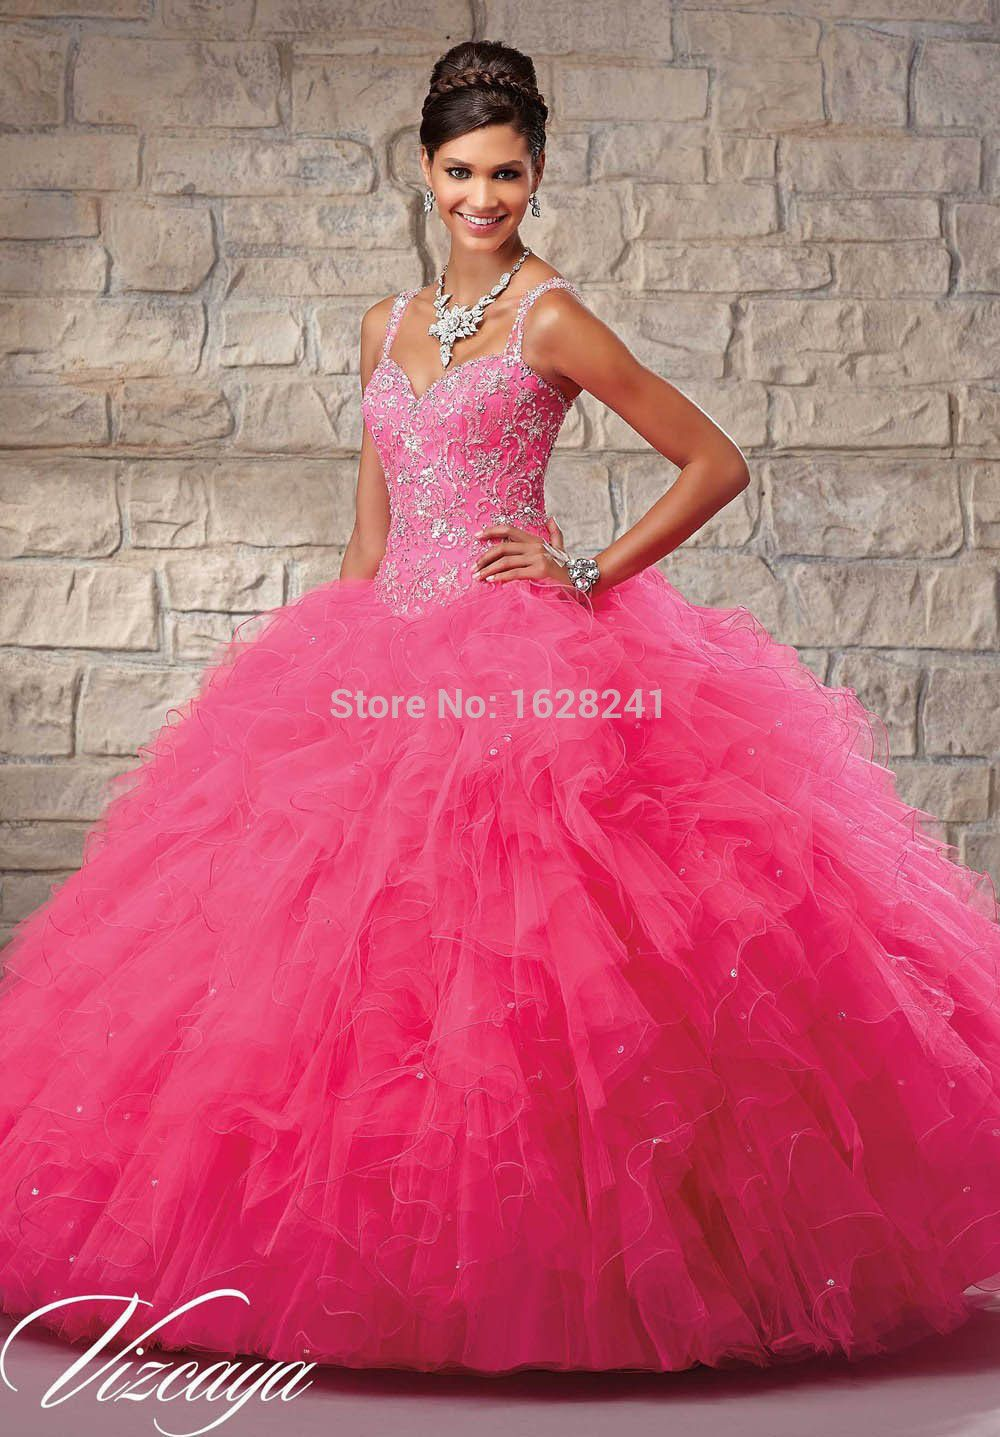 Find More Quinceanera Dresses Information about vestido debutante ...